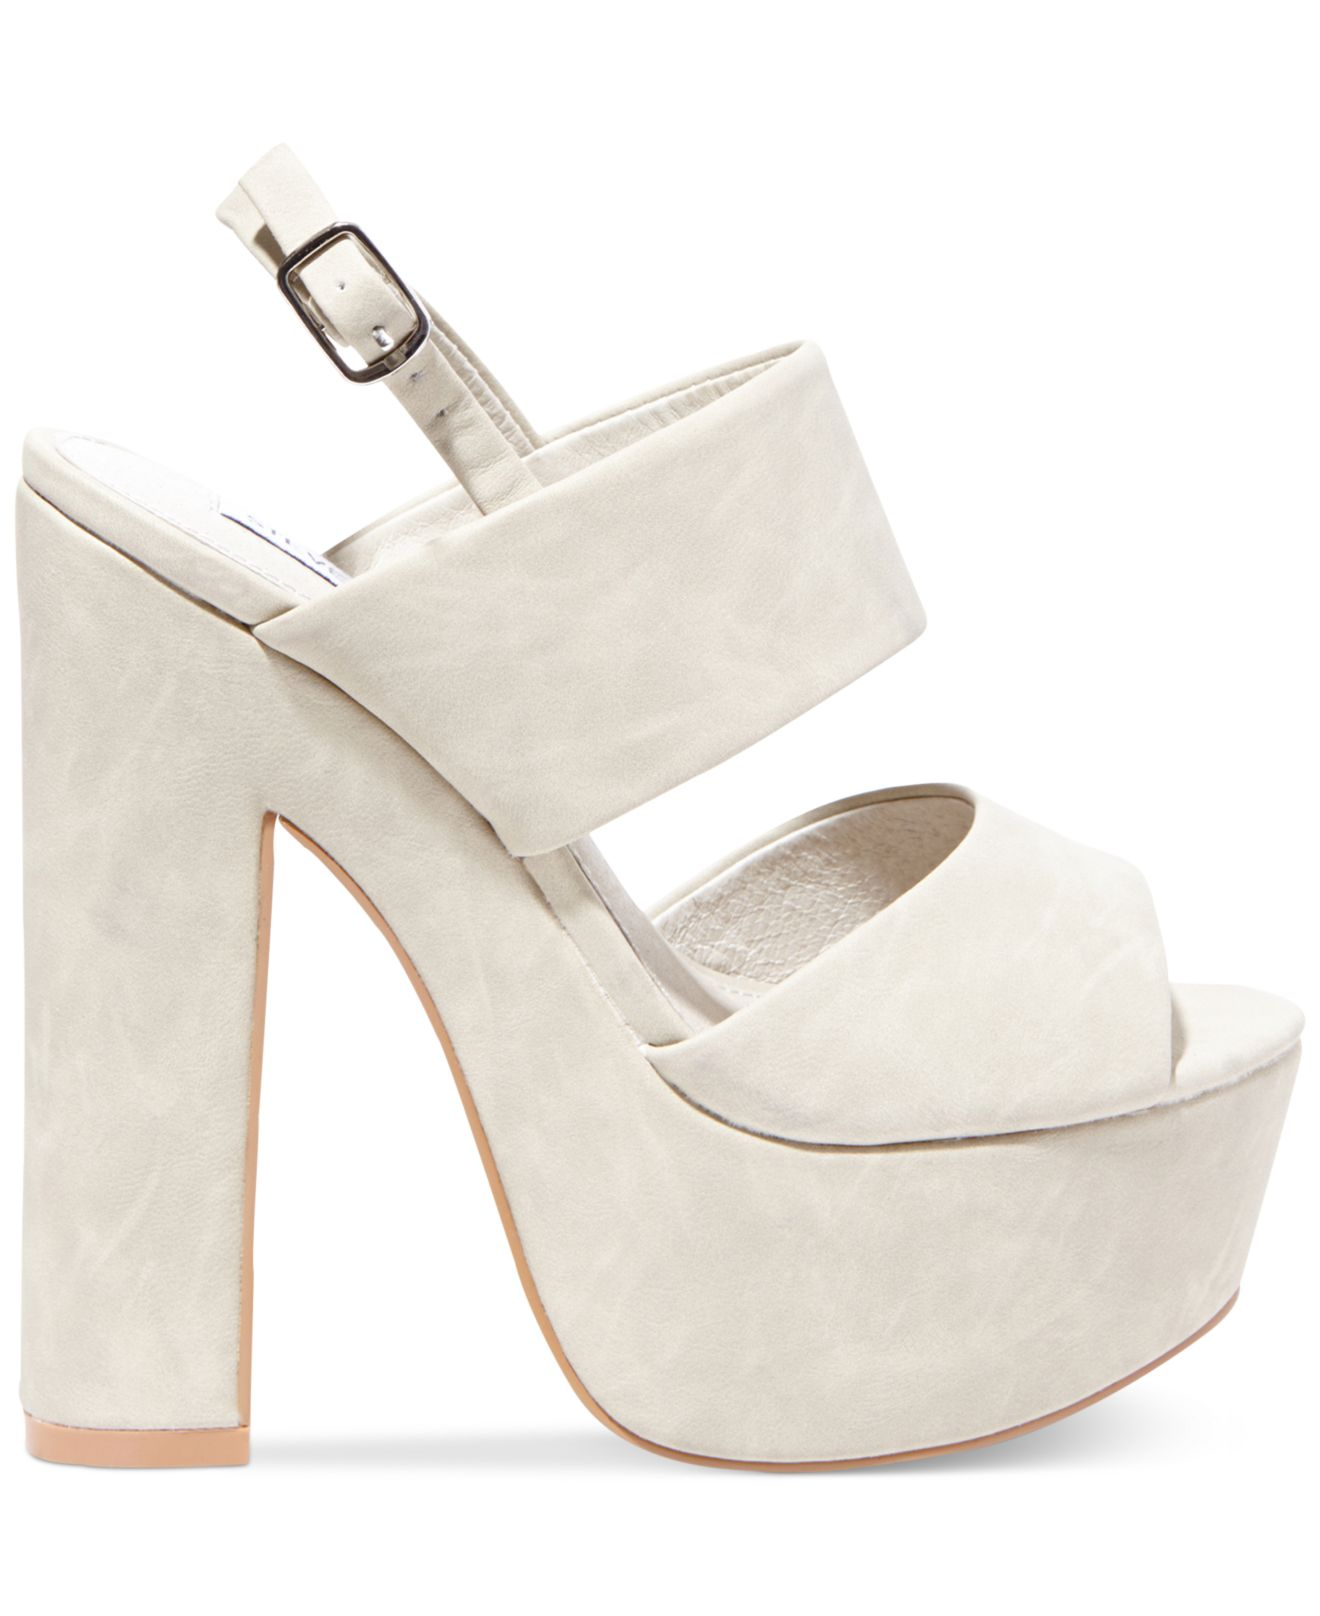 aef143dd30b Lyst - Steve Madden Women s Wellthy Slingback Platform Sandals in White